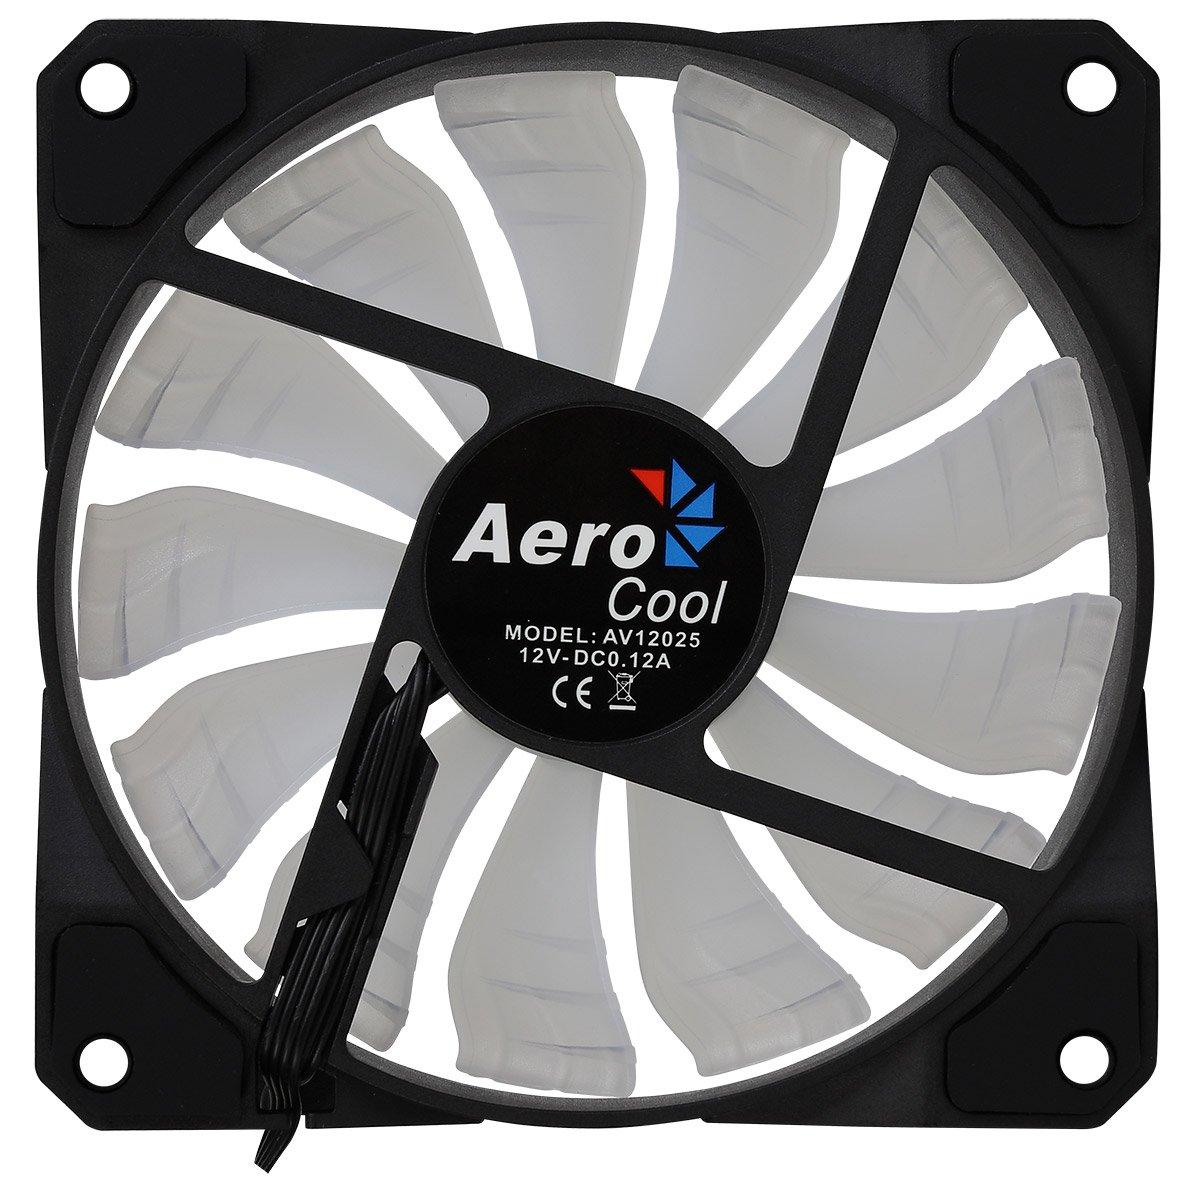 Aerocool Rev Pro color negro Pack de 3 ventiladores para PC con iluminaci/ón RGB 12 cm, aspas curvas, anillo dual LED 3 efectos, controlador P7-H1, 15 dBa